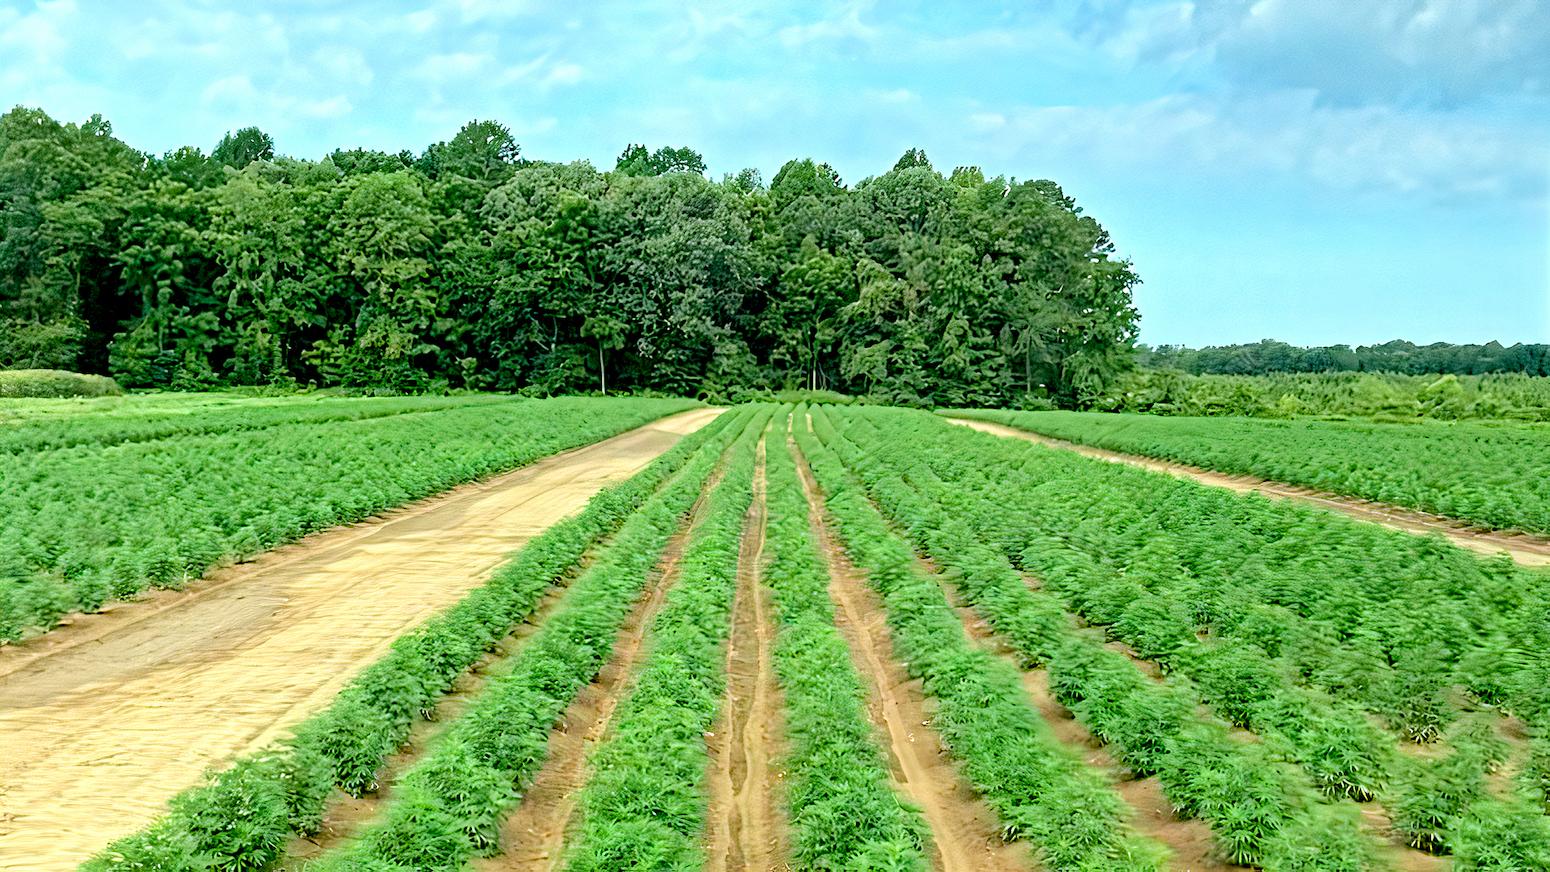 rows of hemp plants